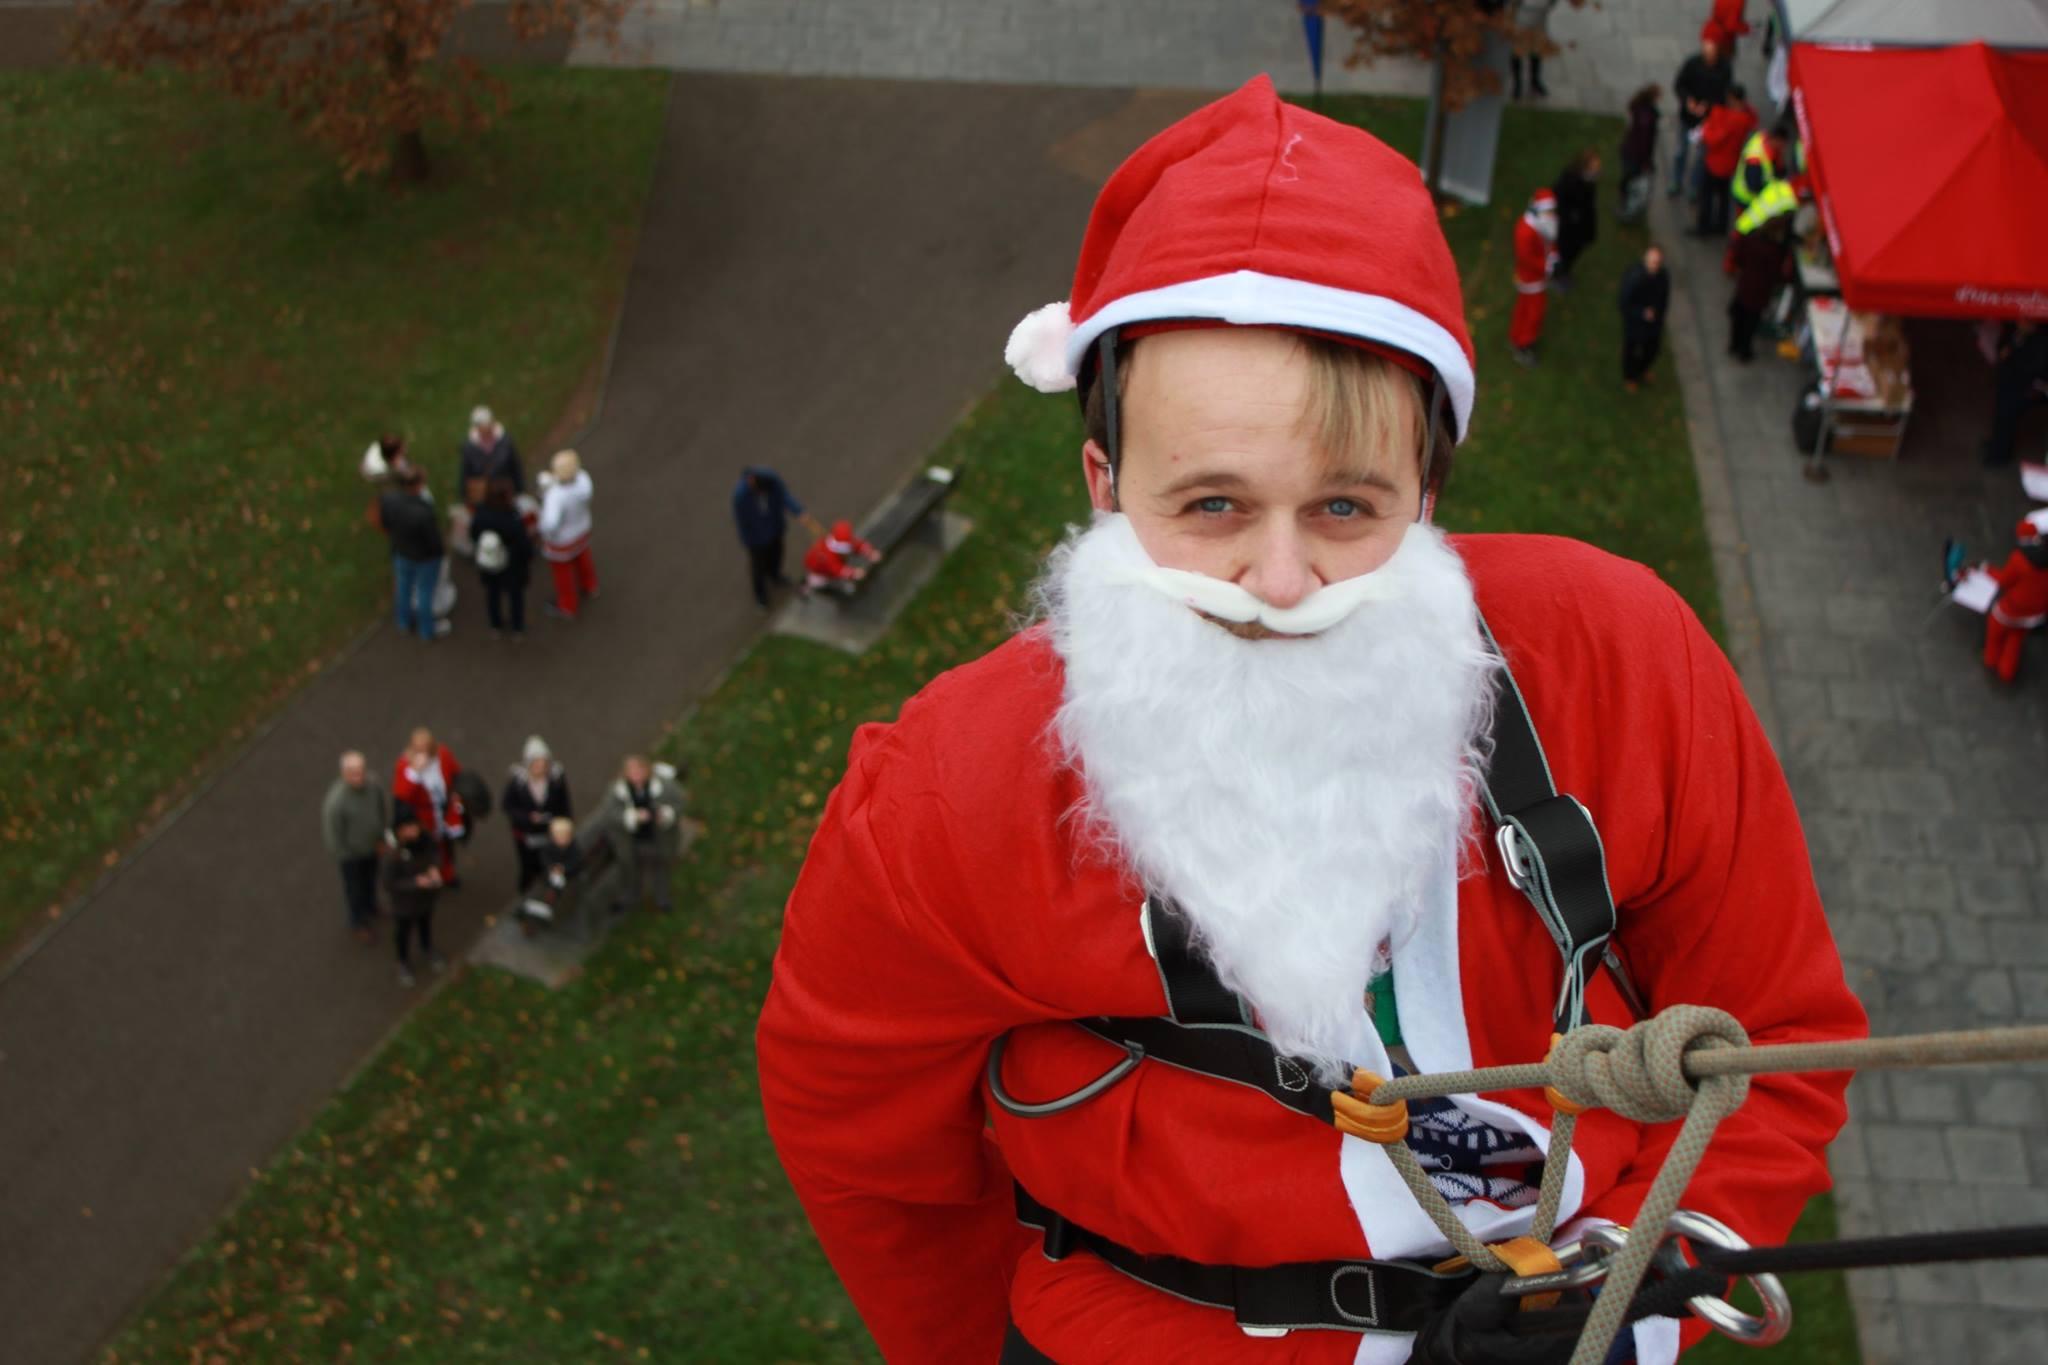 Santa charity abseil event